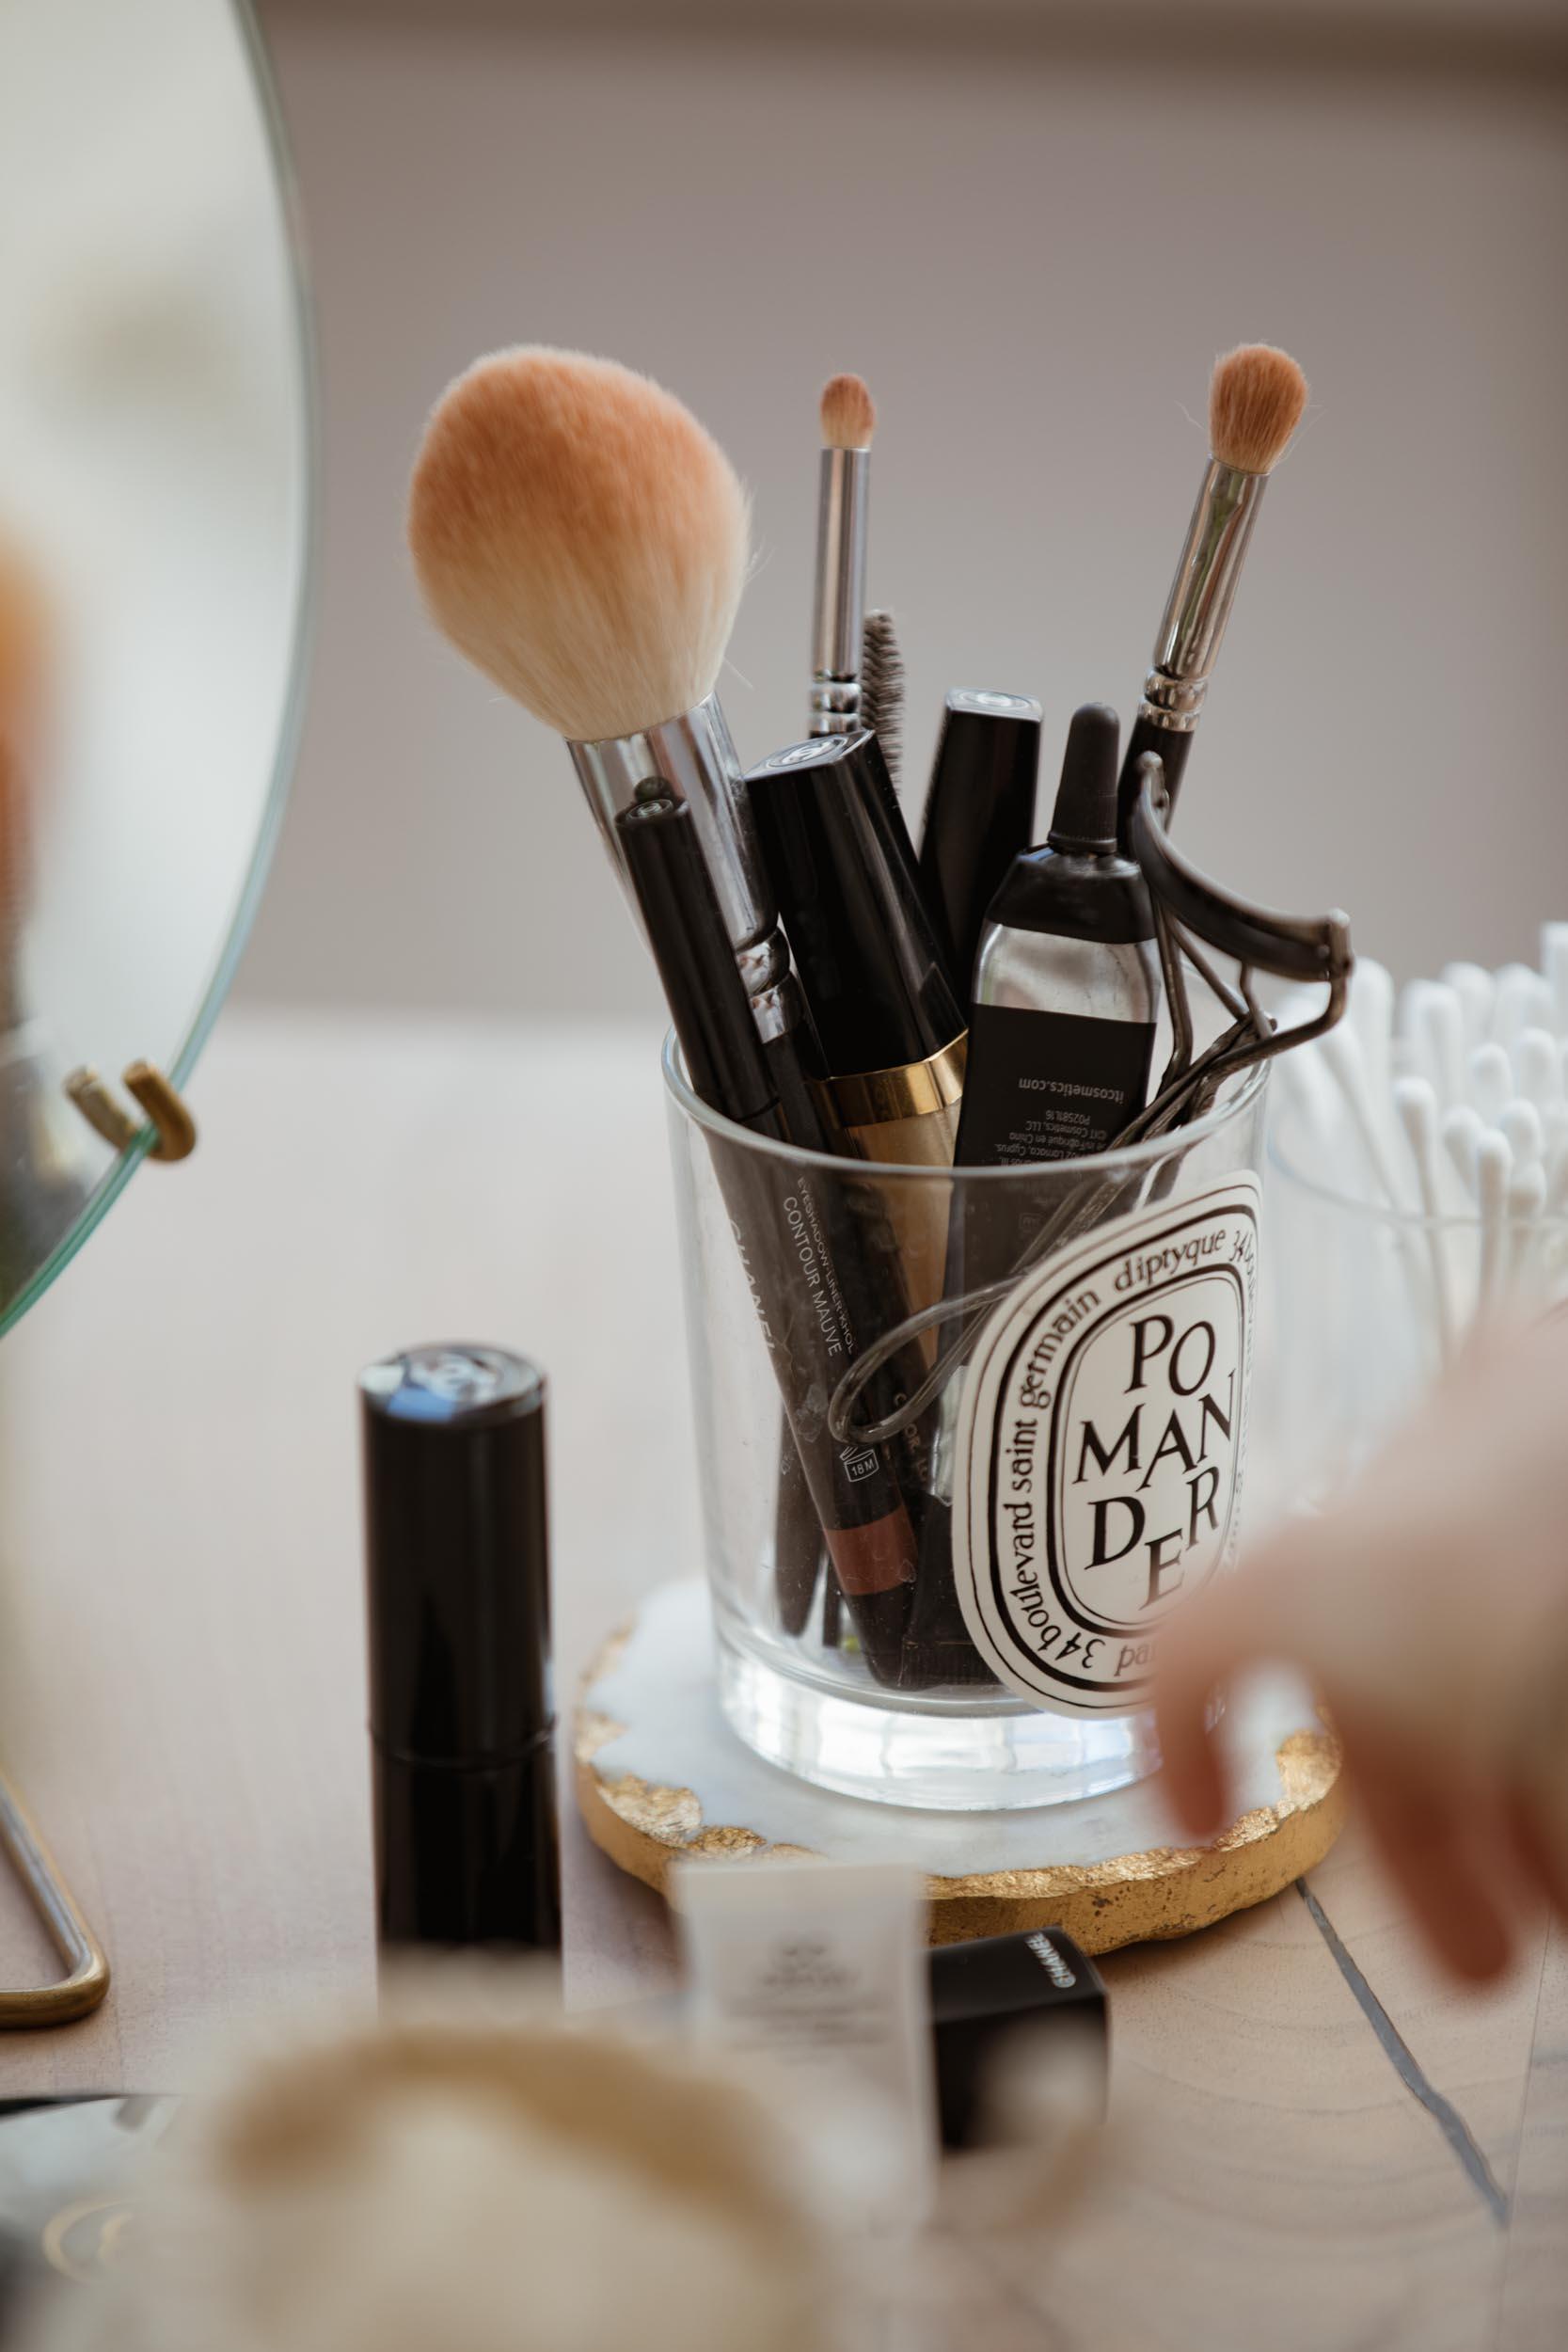 Chanel Desert Dream: The Make Up You Need To Glow This Season - you rock my life @ninawro